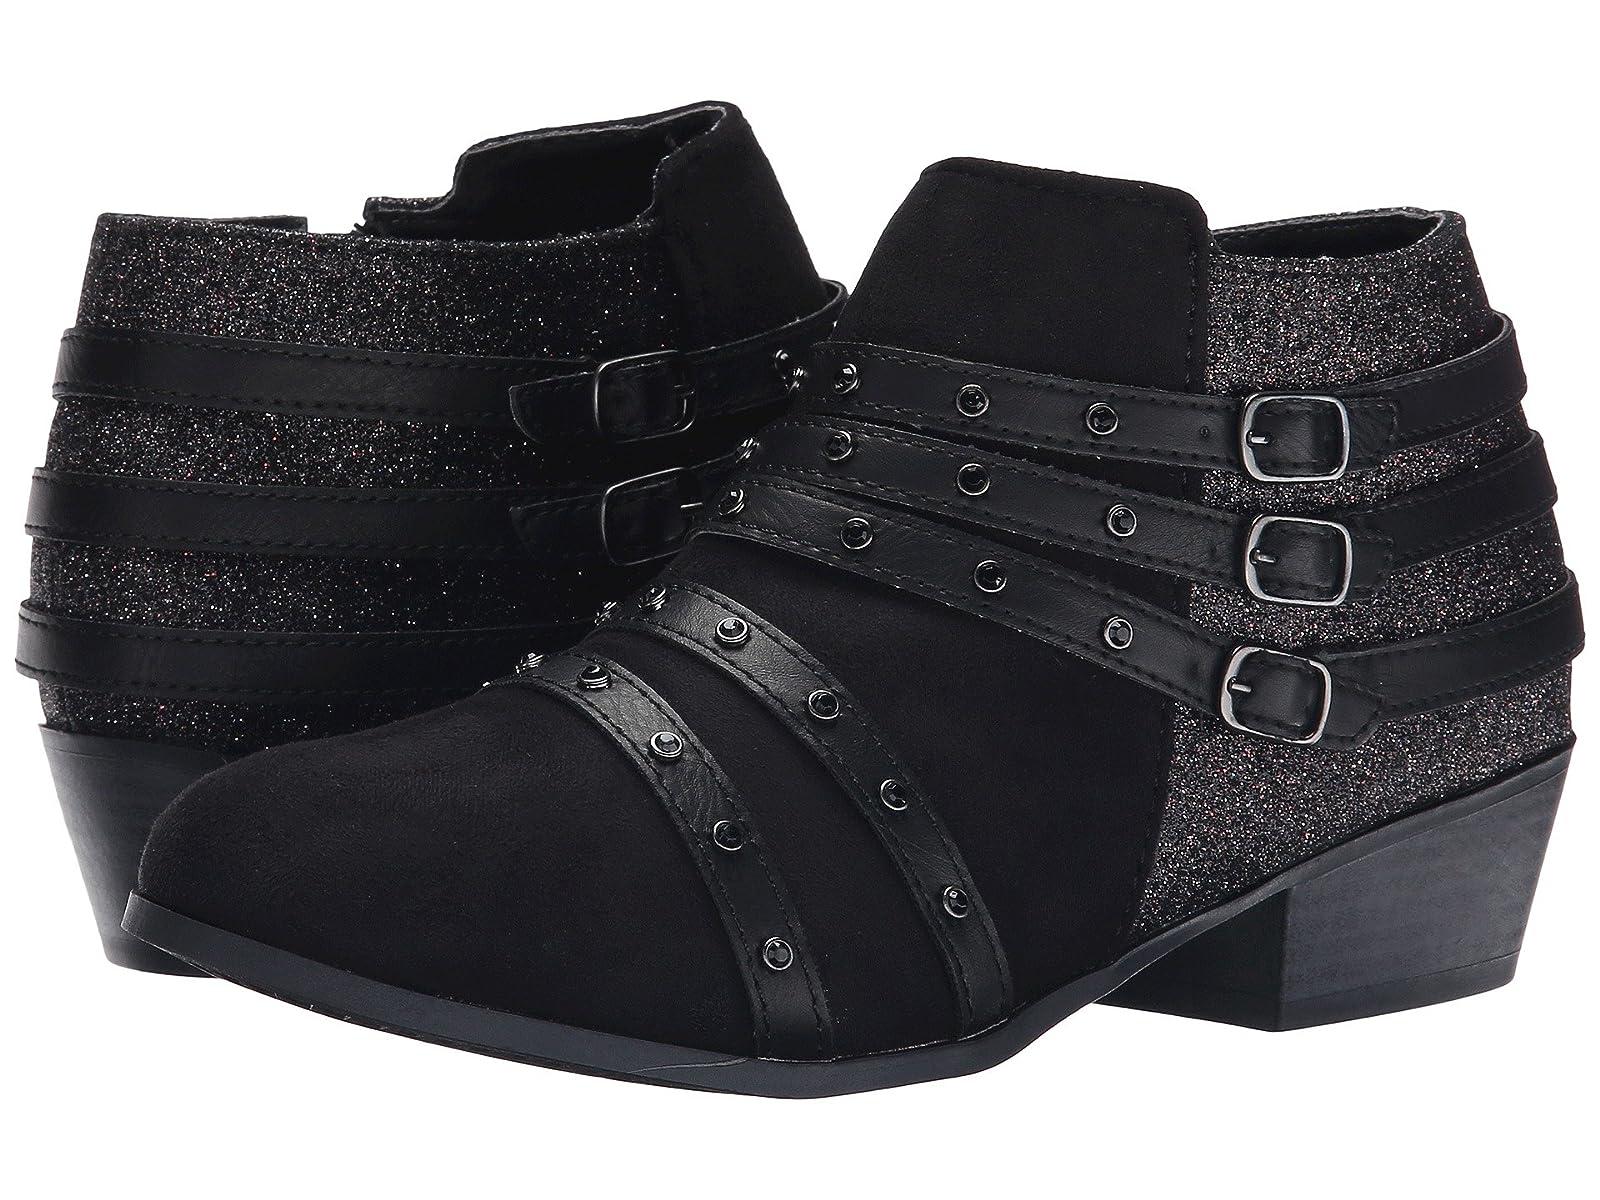 Jessica Simpson Kids Eden (Little Kid/Big Kid)Cheap and distinctive eye-catching shoes